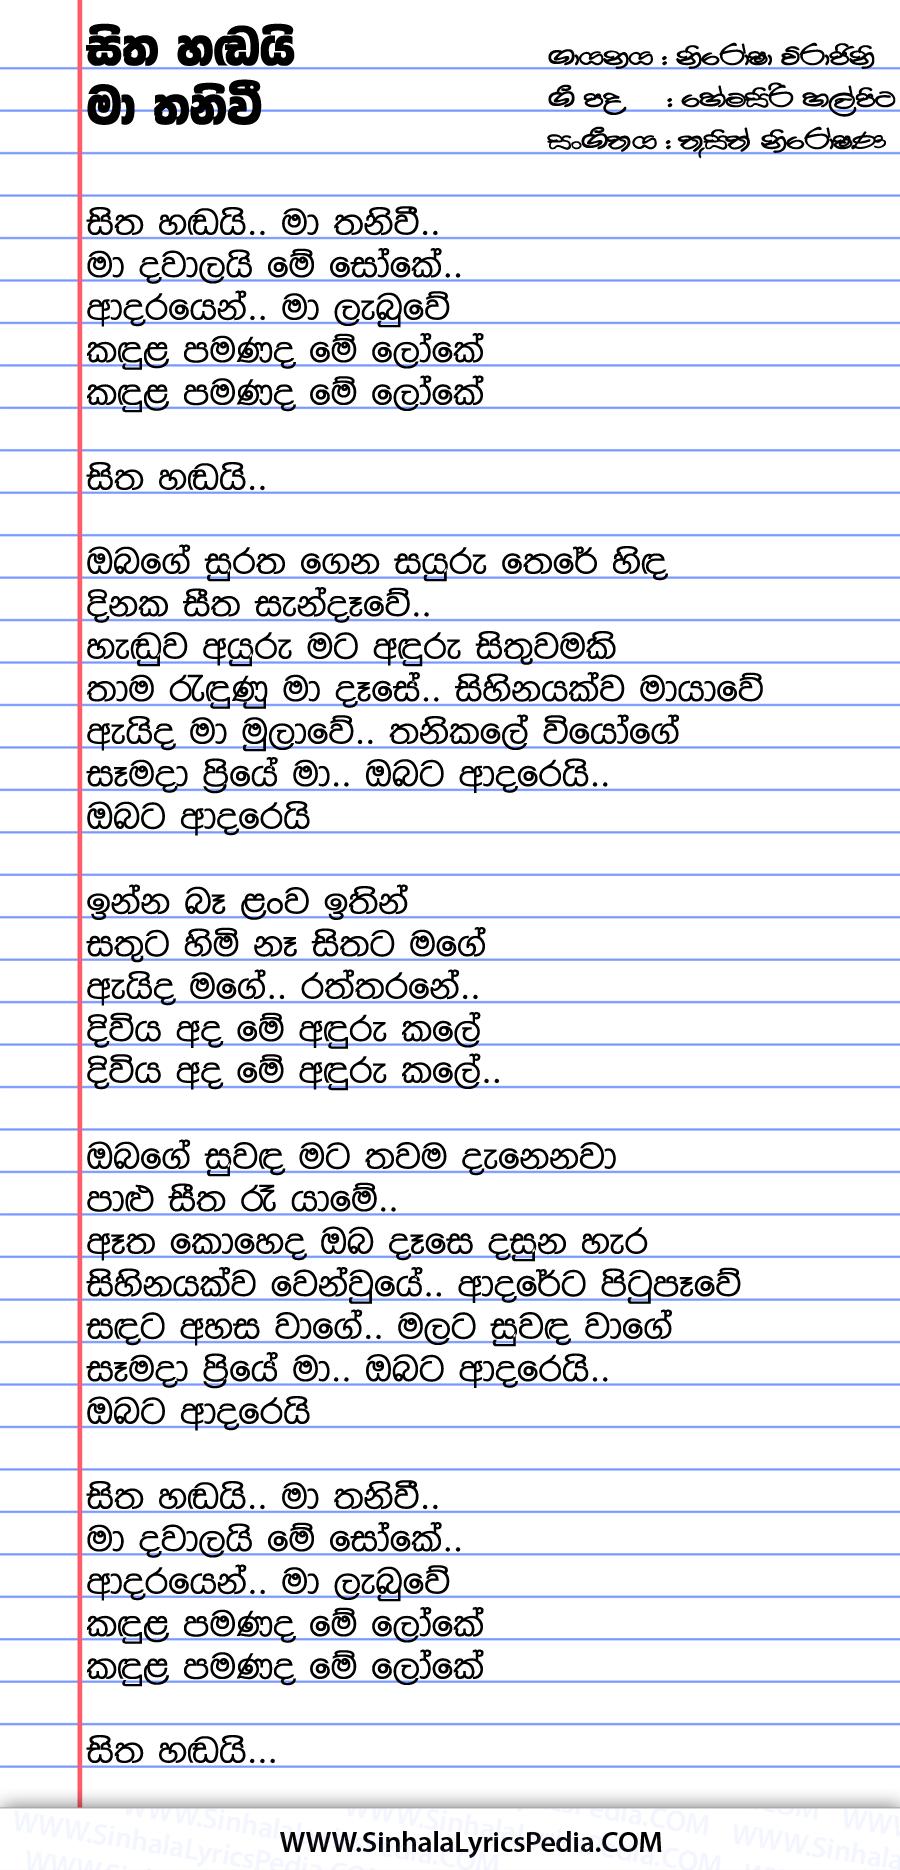 Sitha Hadai Ma Thaniwee Song Lyrics